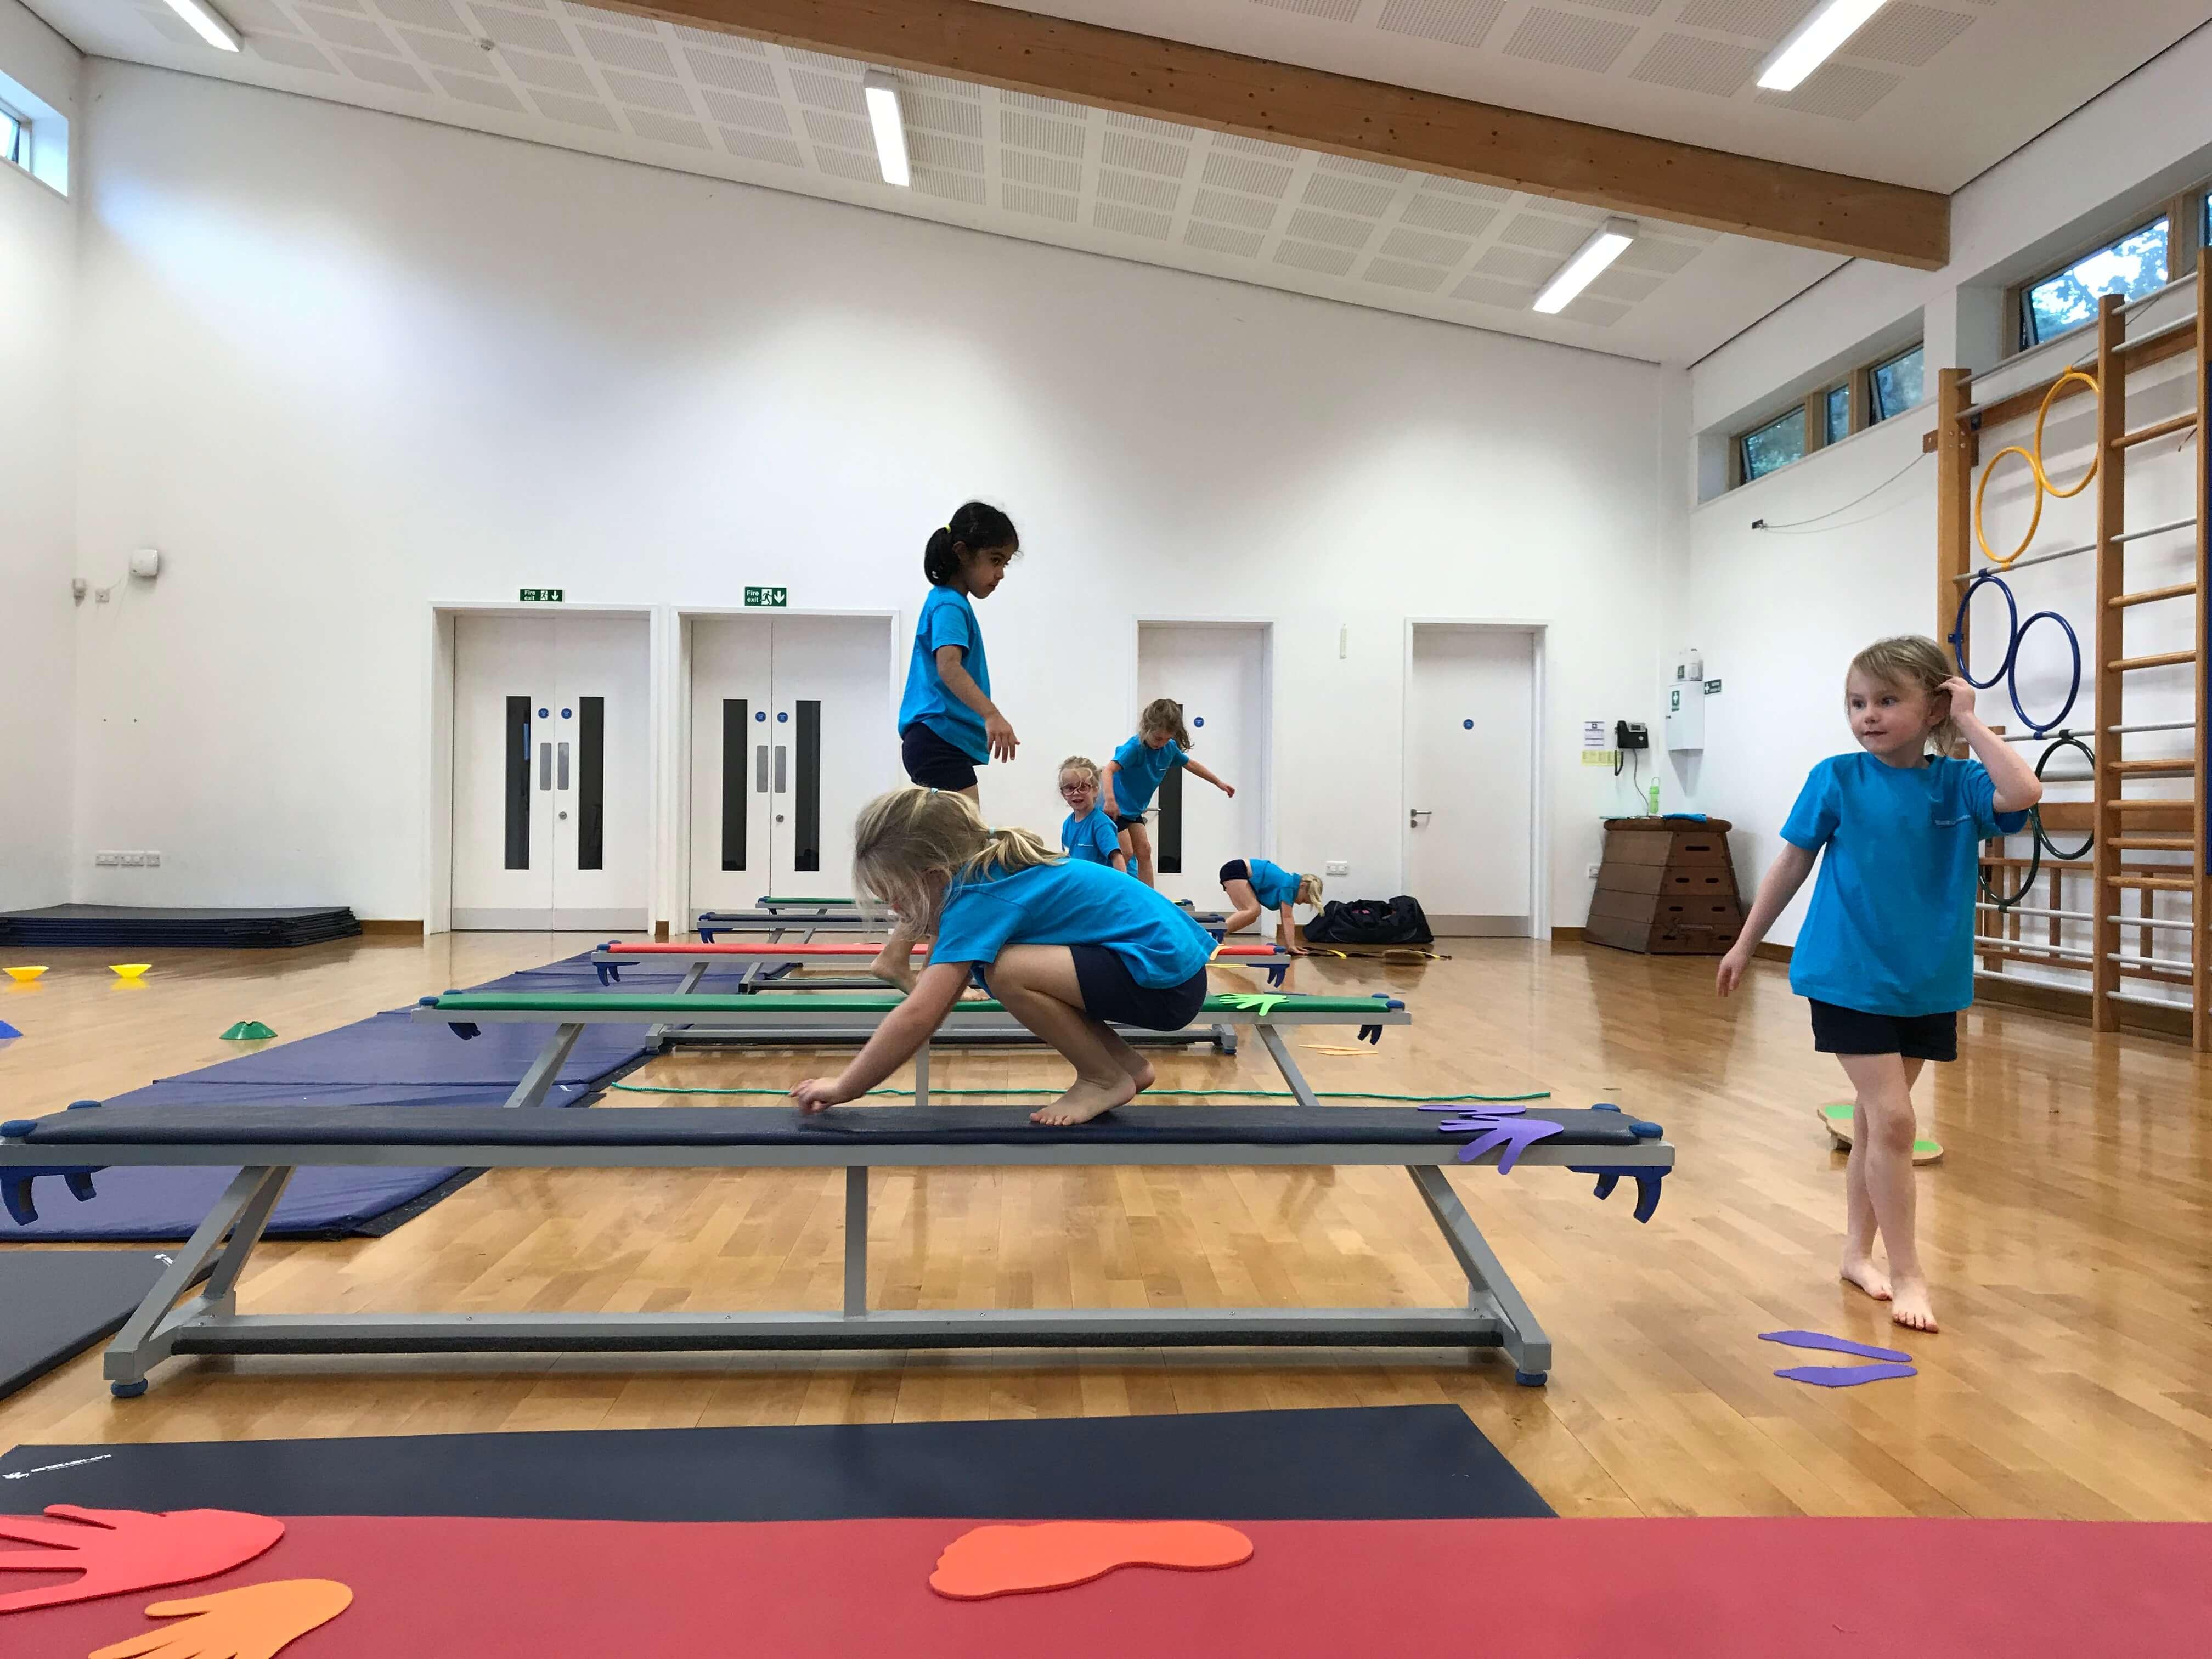 Children in gymnastic class